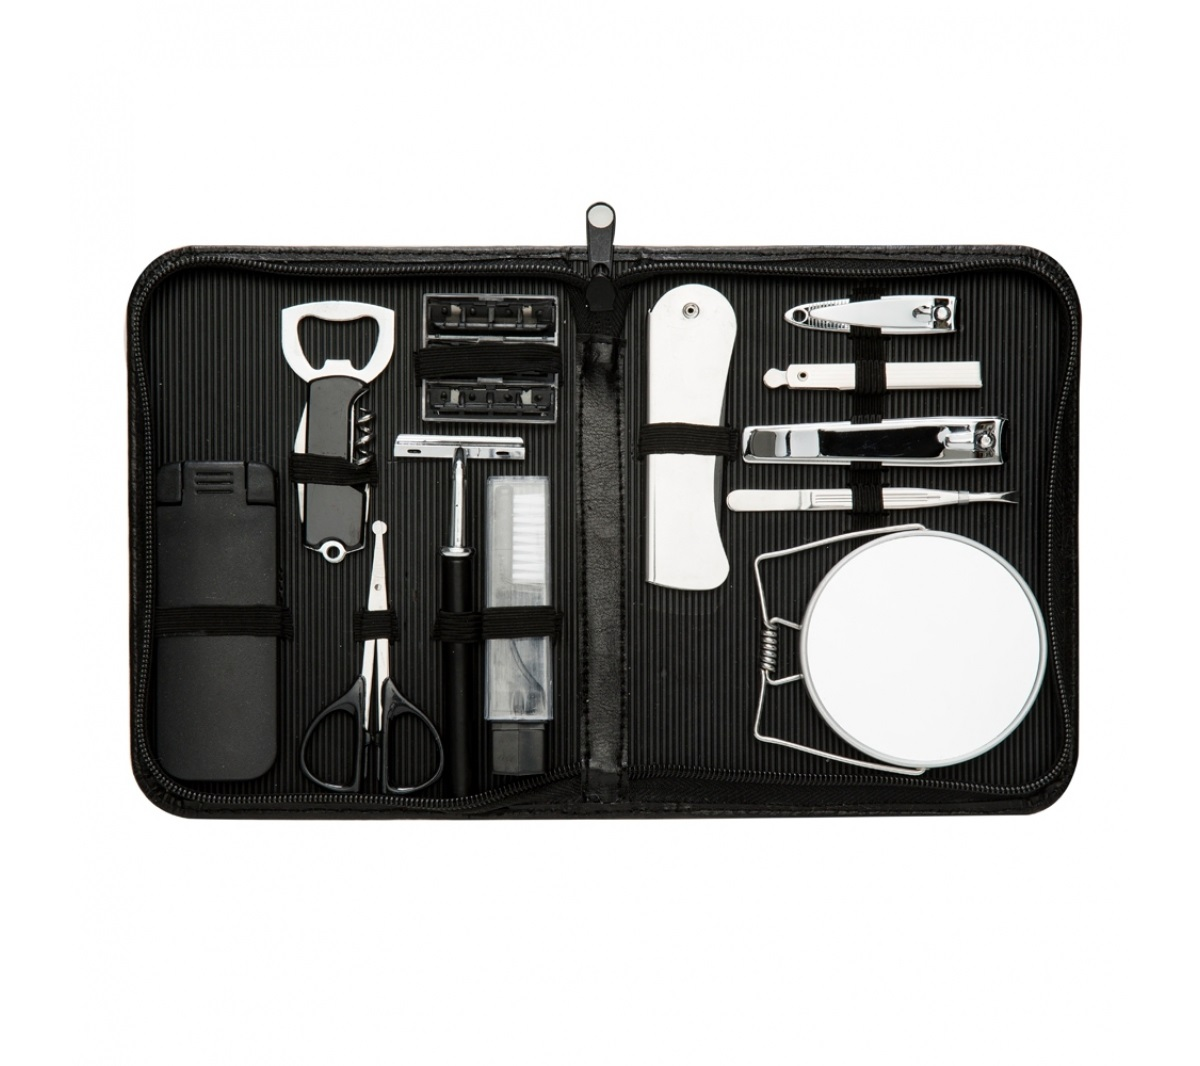 Brinde kit masculino personalizado 12 peças - Flic Brindes 2504543b568